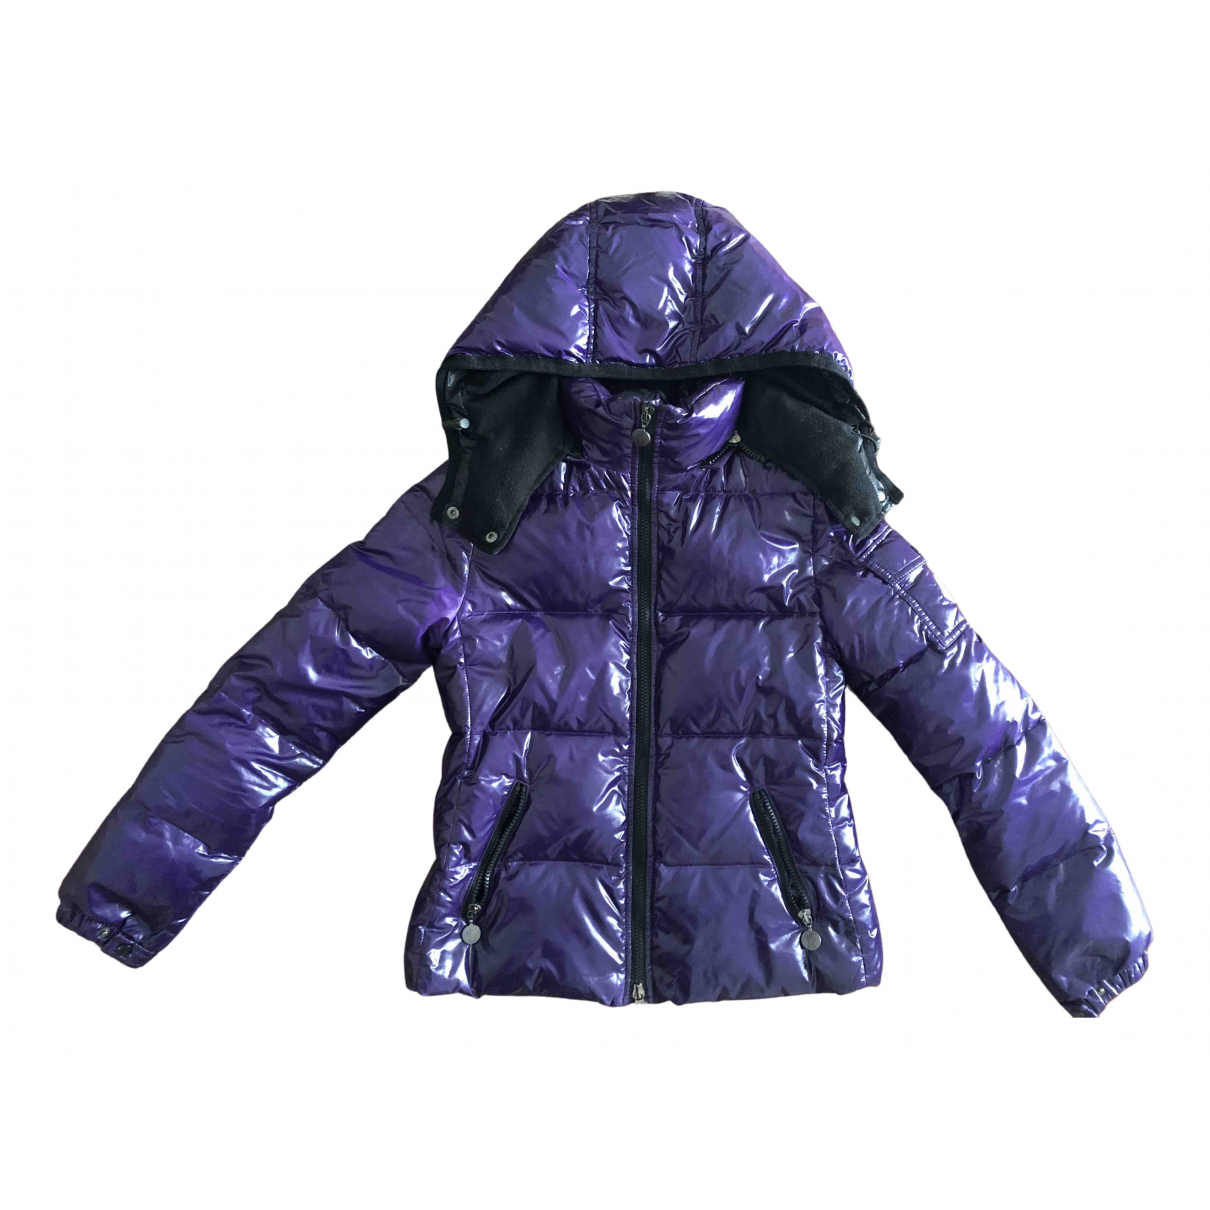 Moncler Hood Purple jacket & coat for Kids 12 years - XS FR